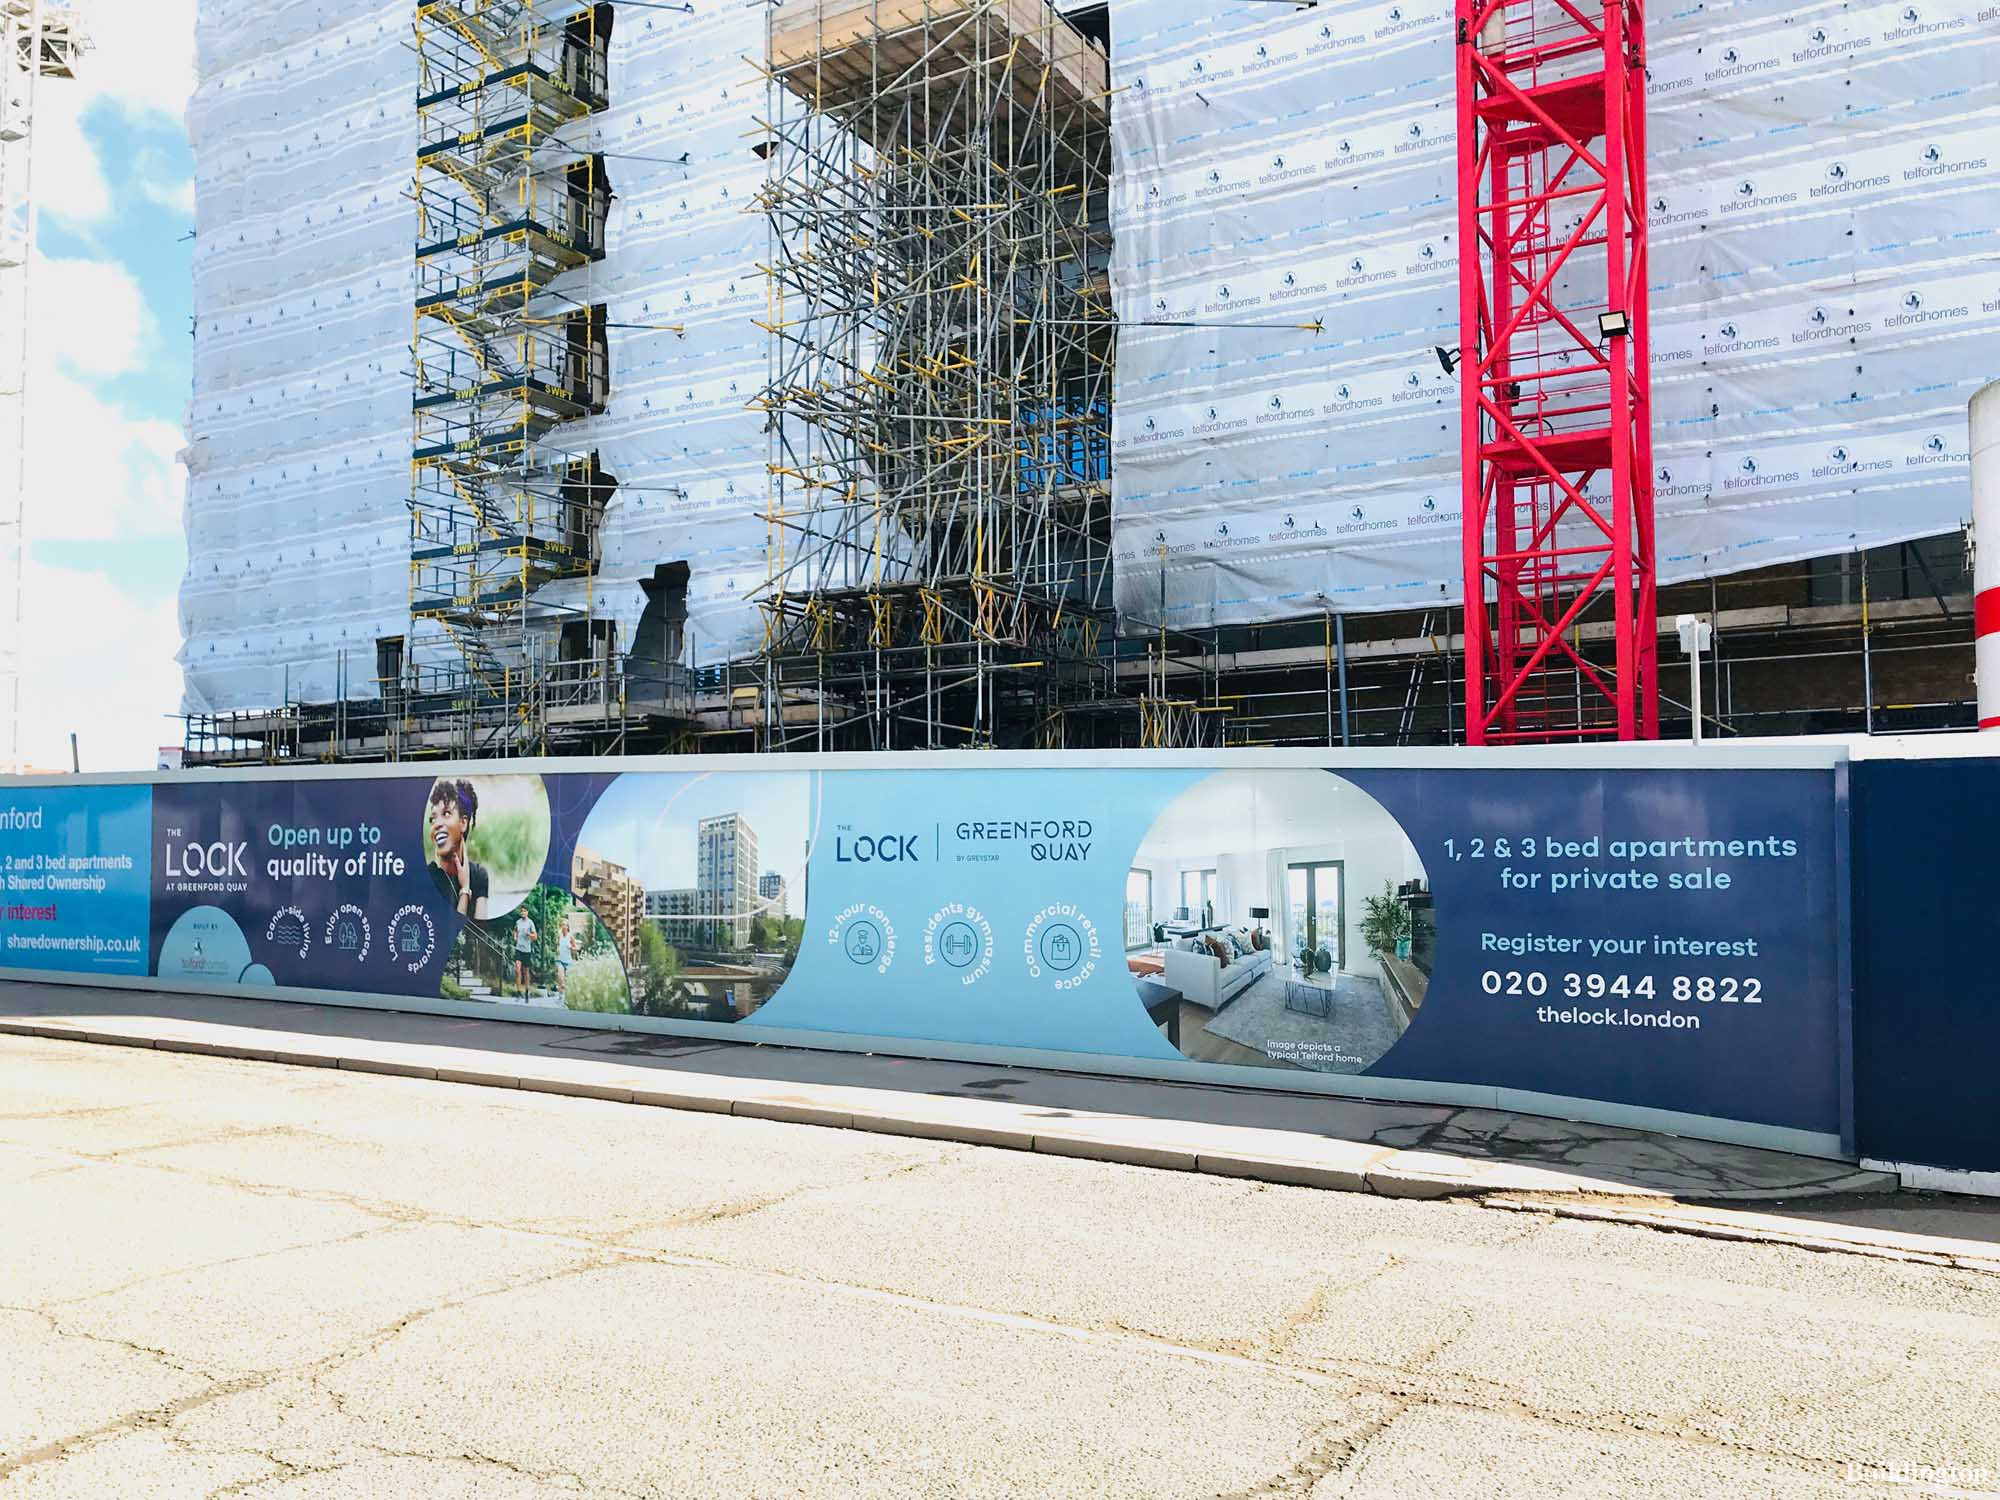 The Lock development hoarding on Oldfield Lane North in Greenford UB6.